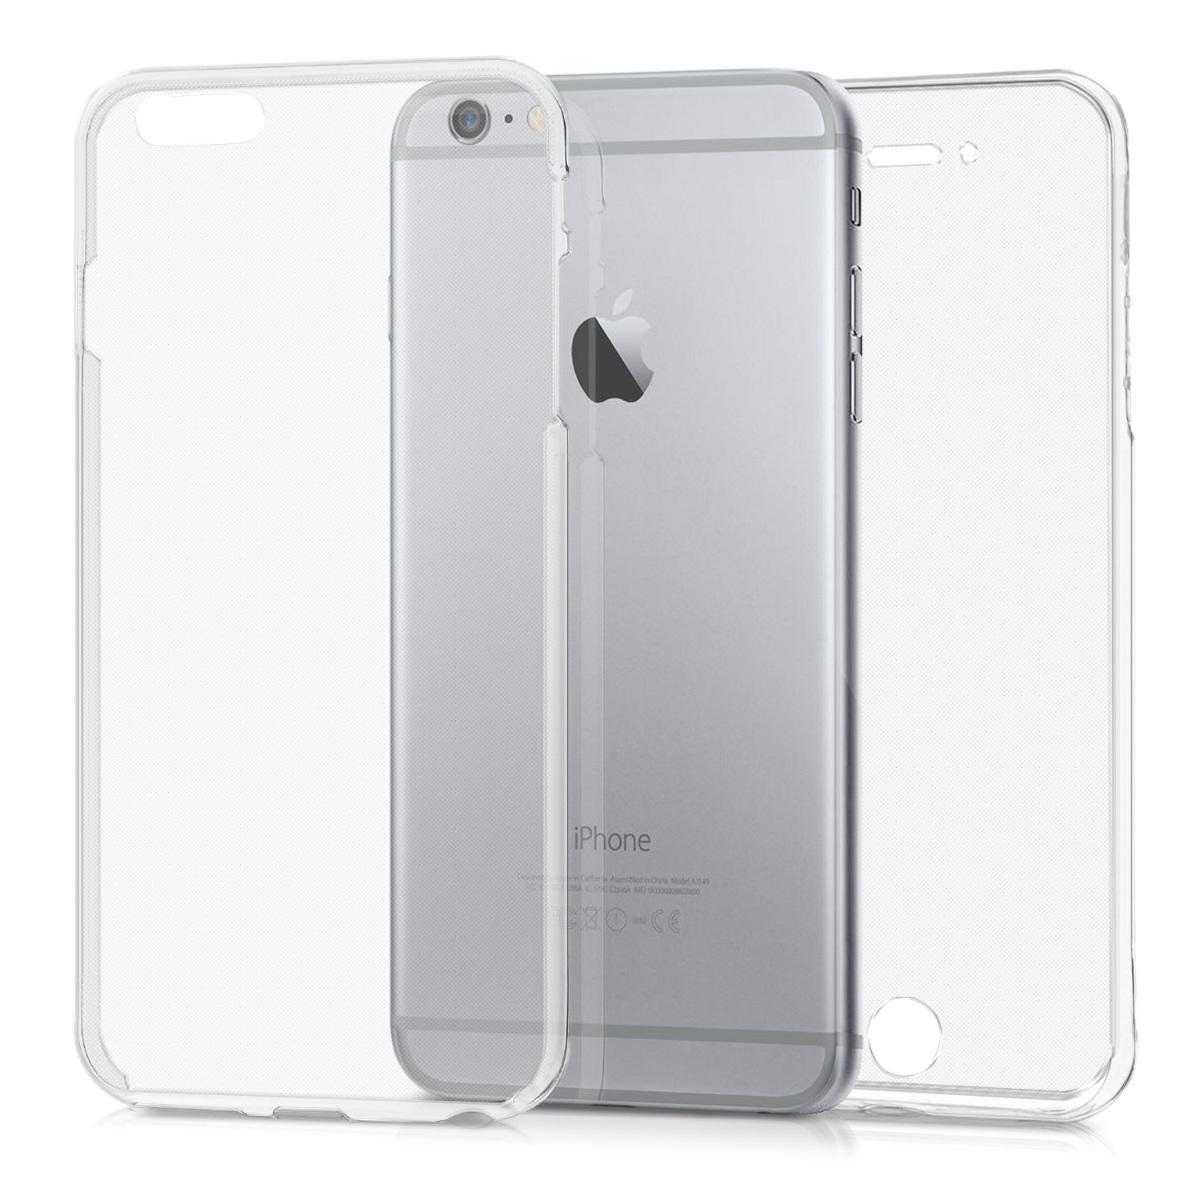 KW Διάφανη Θήκη Σιλικόνης Full Body iPhone 6S Plus / 6 Plus (44958.03)